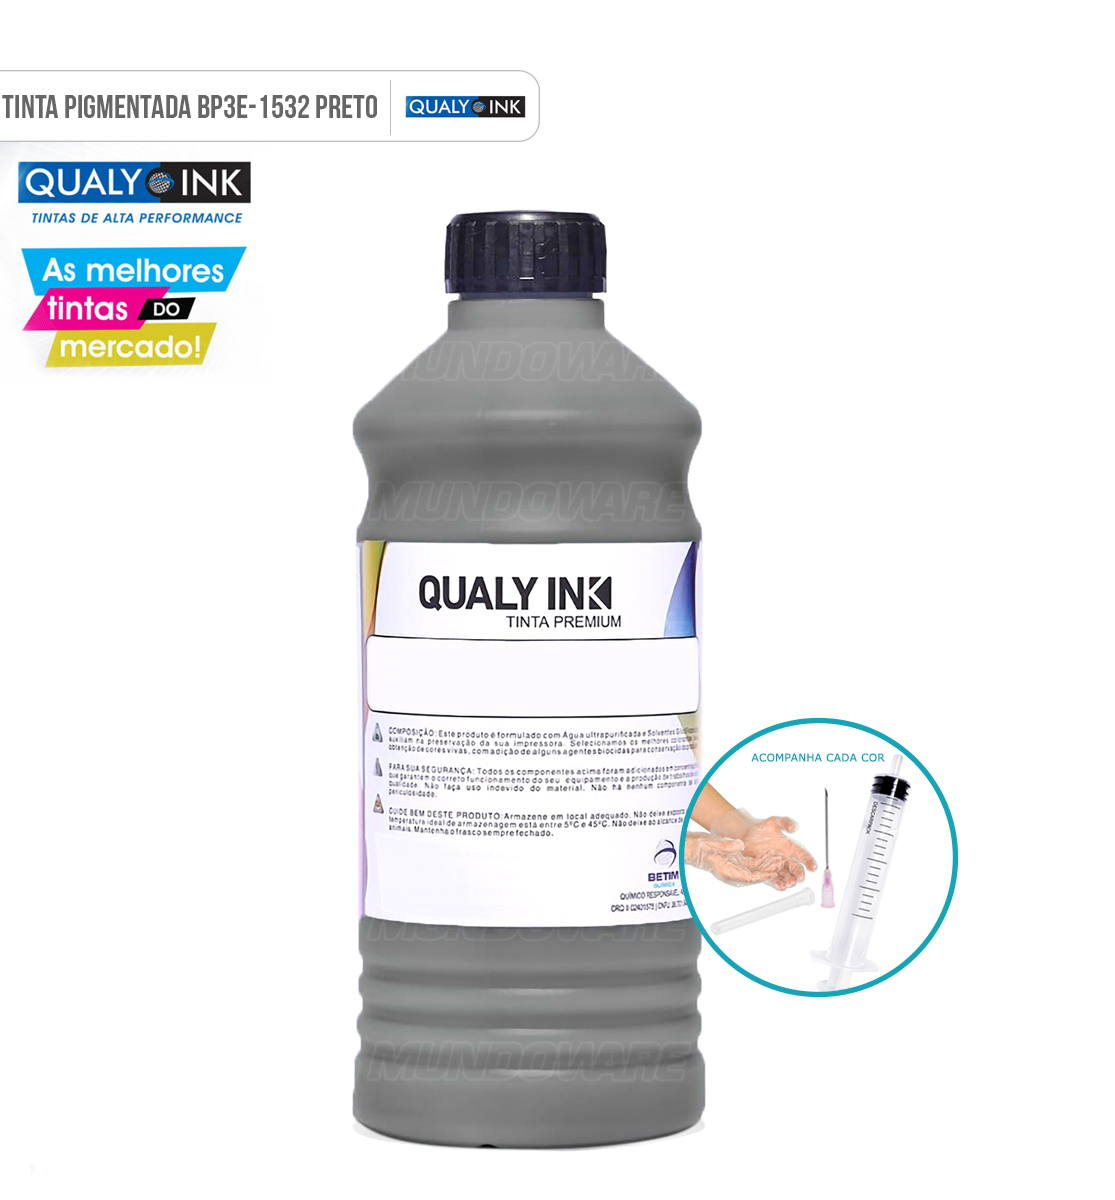 Refil de Tinta Qualy-Ink Preta Pigmentada para Epson série 544 504 impressoras L3108 L3110 L3111 L3118 L3119 L3150 L3158 L4150 L4158 L4160 L4168 L5190 L6160 L6161 L6168 L6170 L6171 L6178 L6190 L6191 L6198